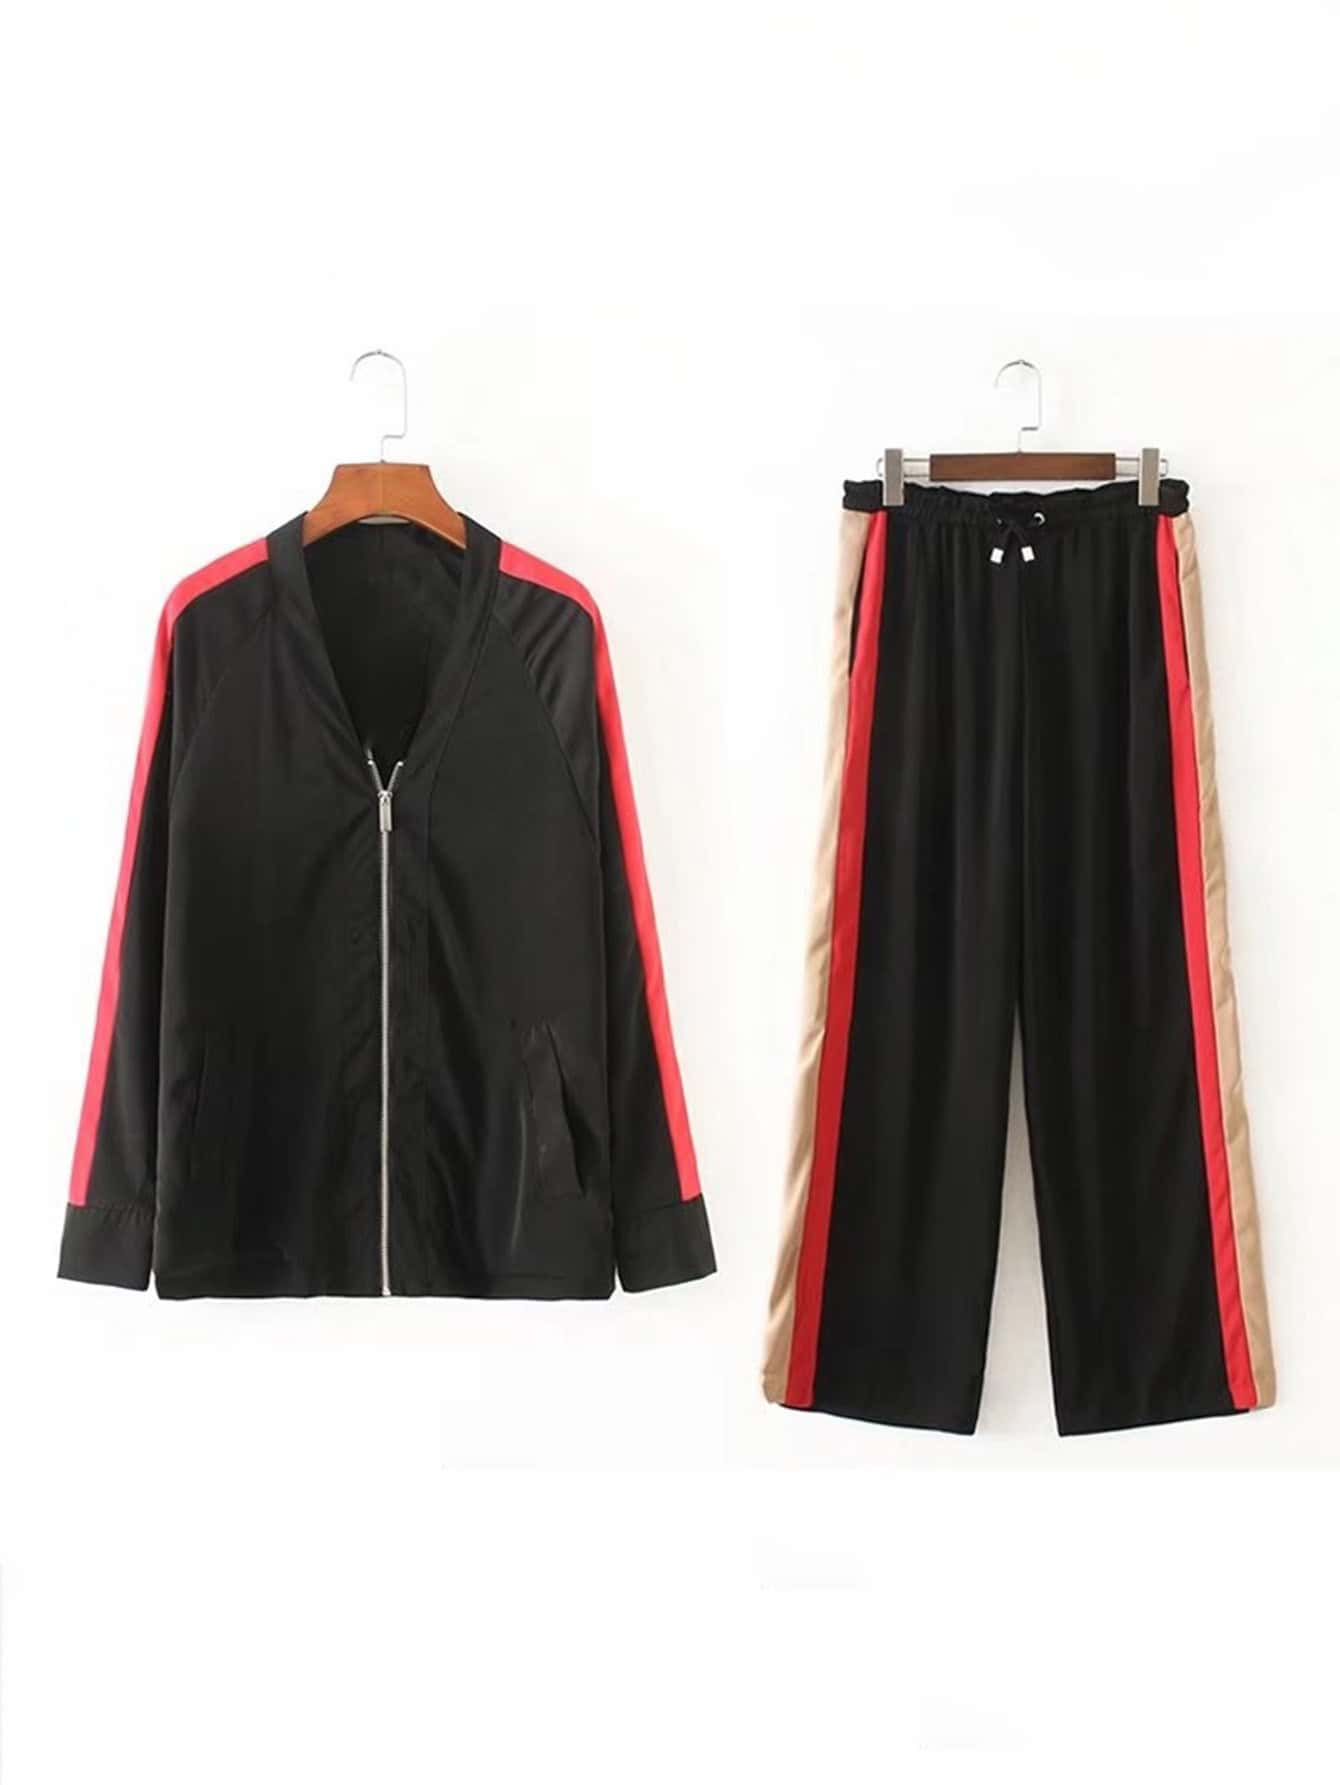 Raglan Sleeve Striped Side Coat With Drawstring Pants twopiece170810201